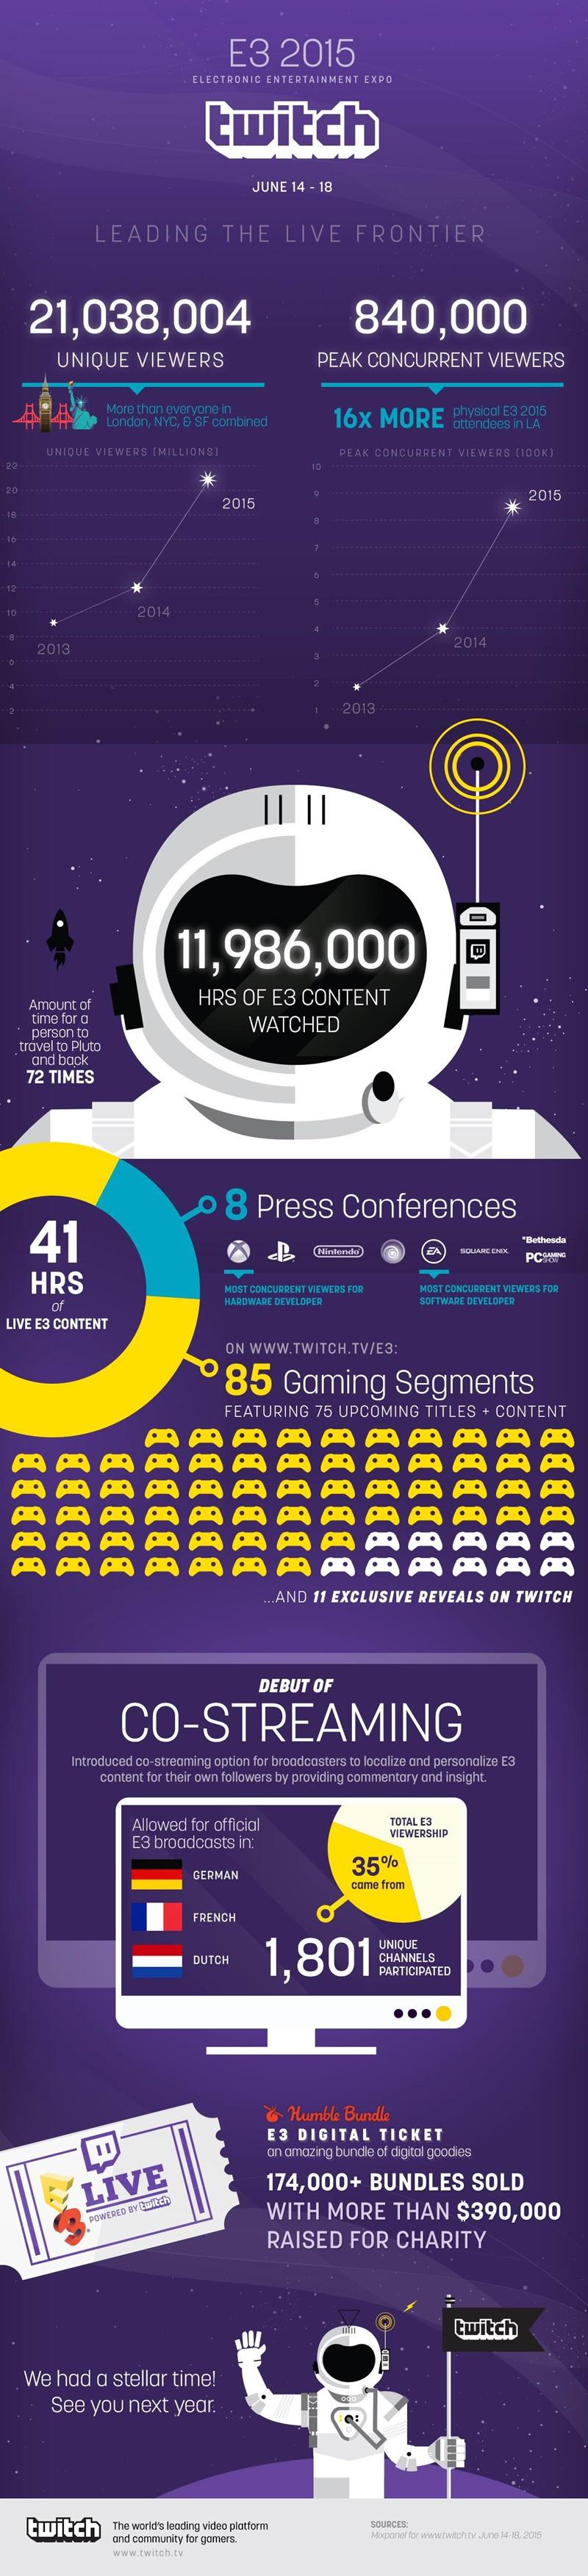 twitch-e3-infographic